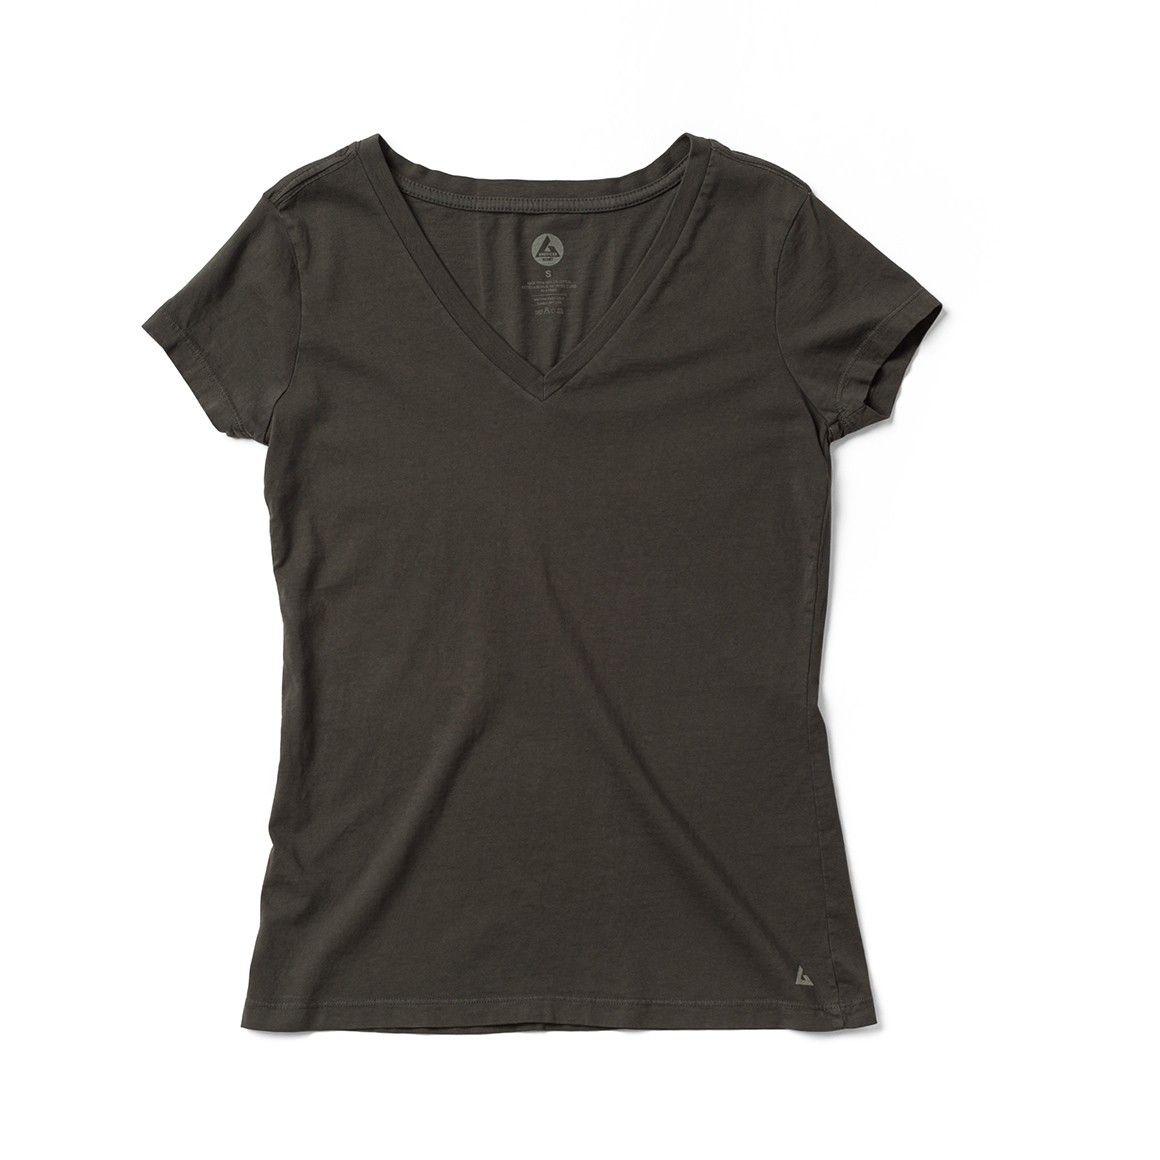 Womens Short Sleeve V-Neck T-Shirt - T-Shirts